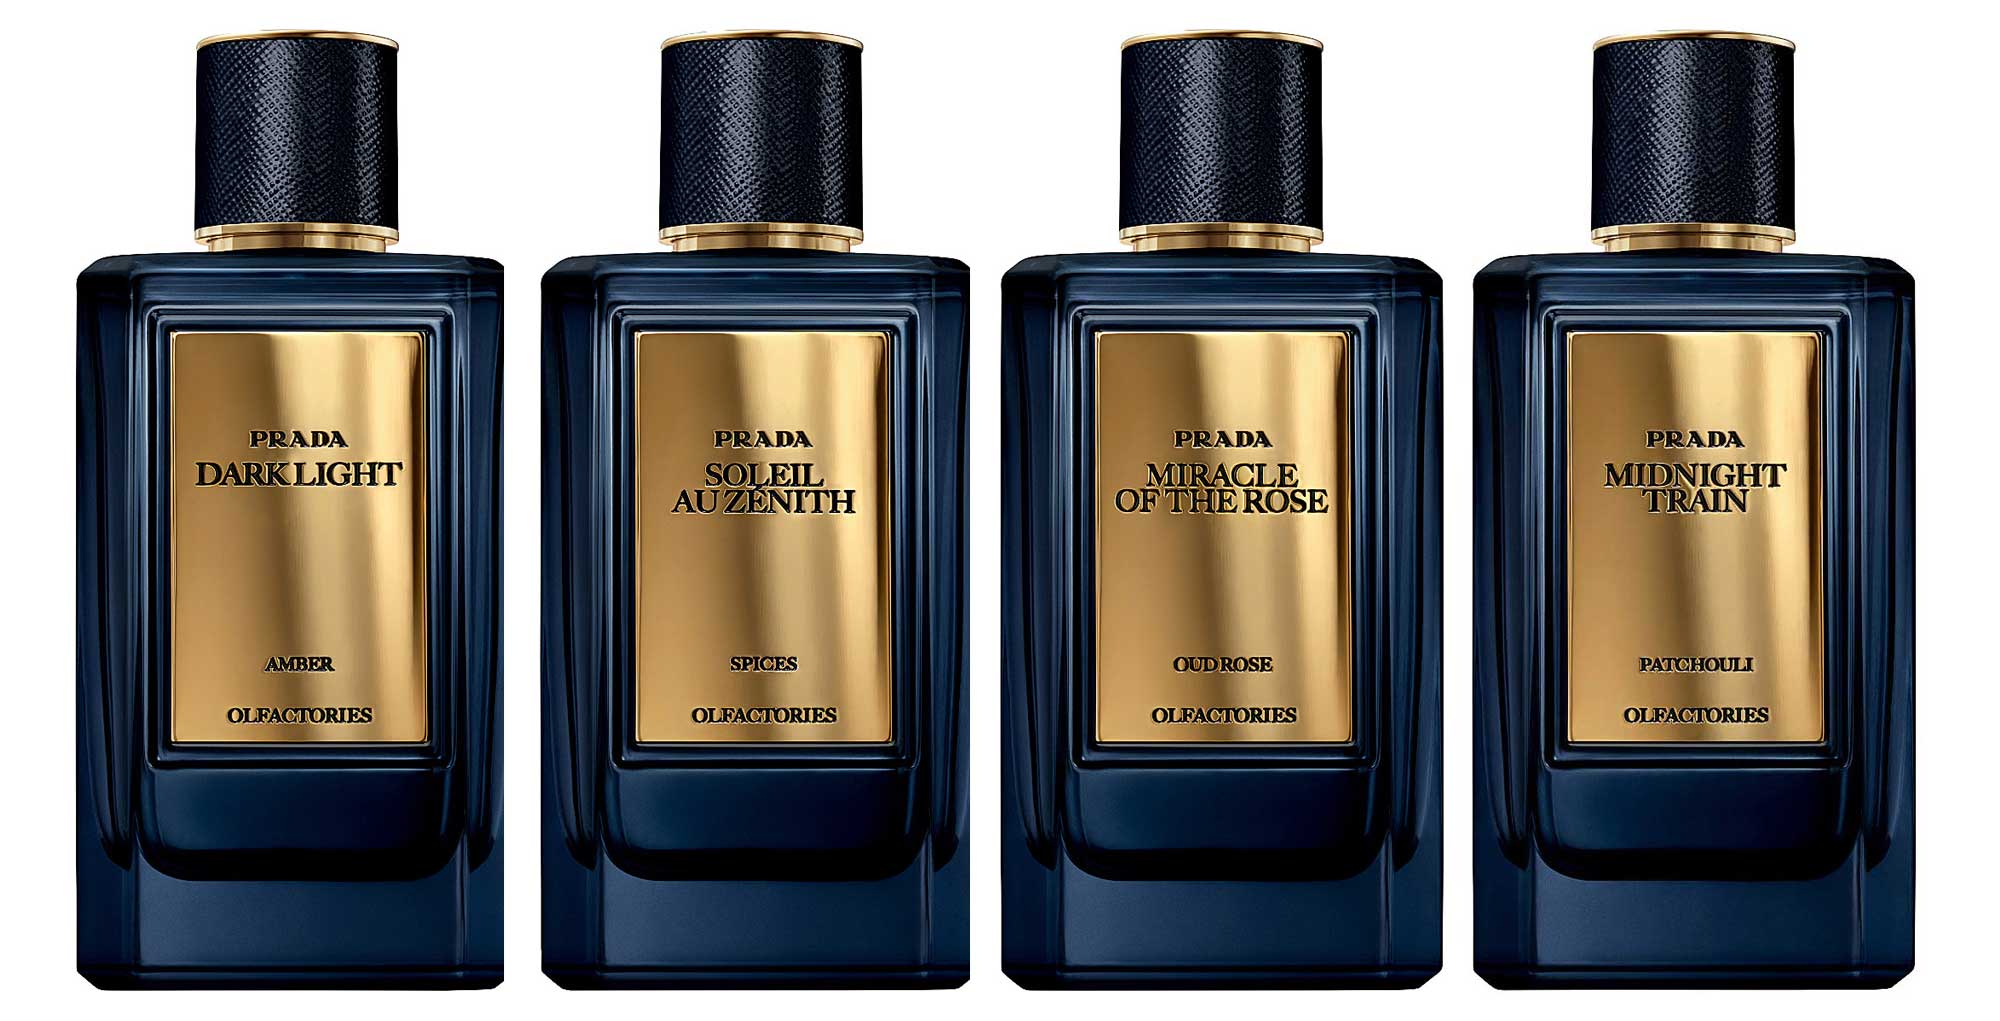 ~ Mirages Nouveaux Olfactifs Prada Parfums 80PwOkNnX